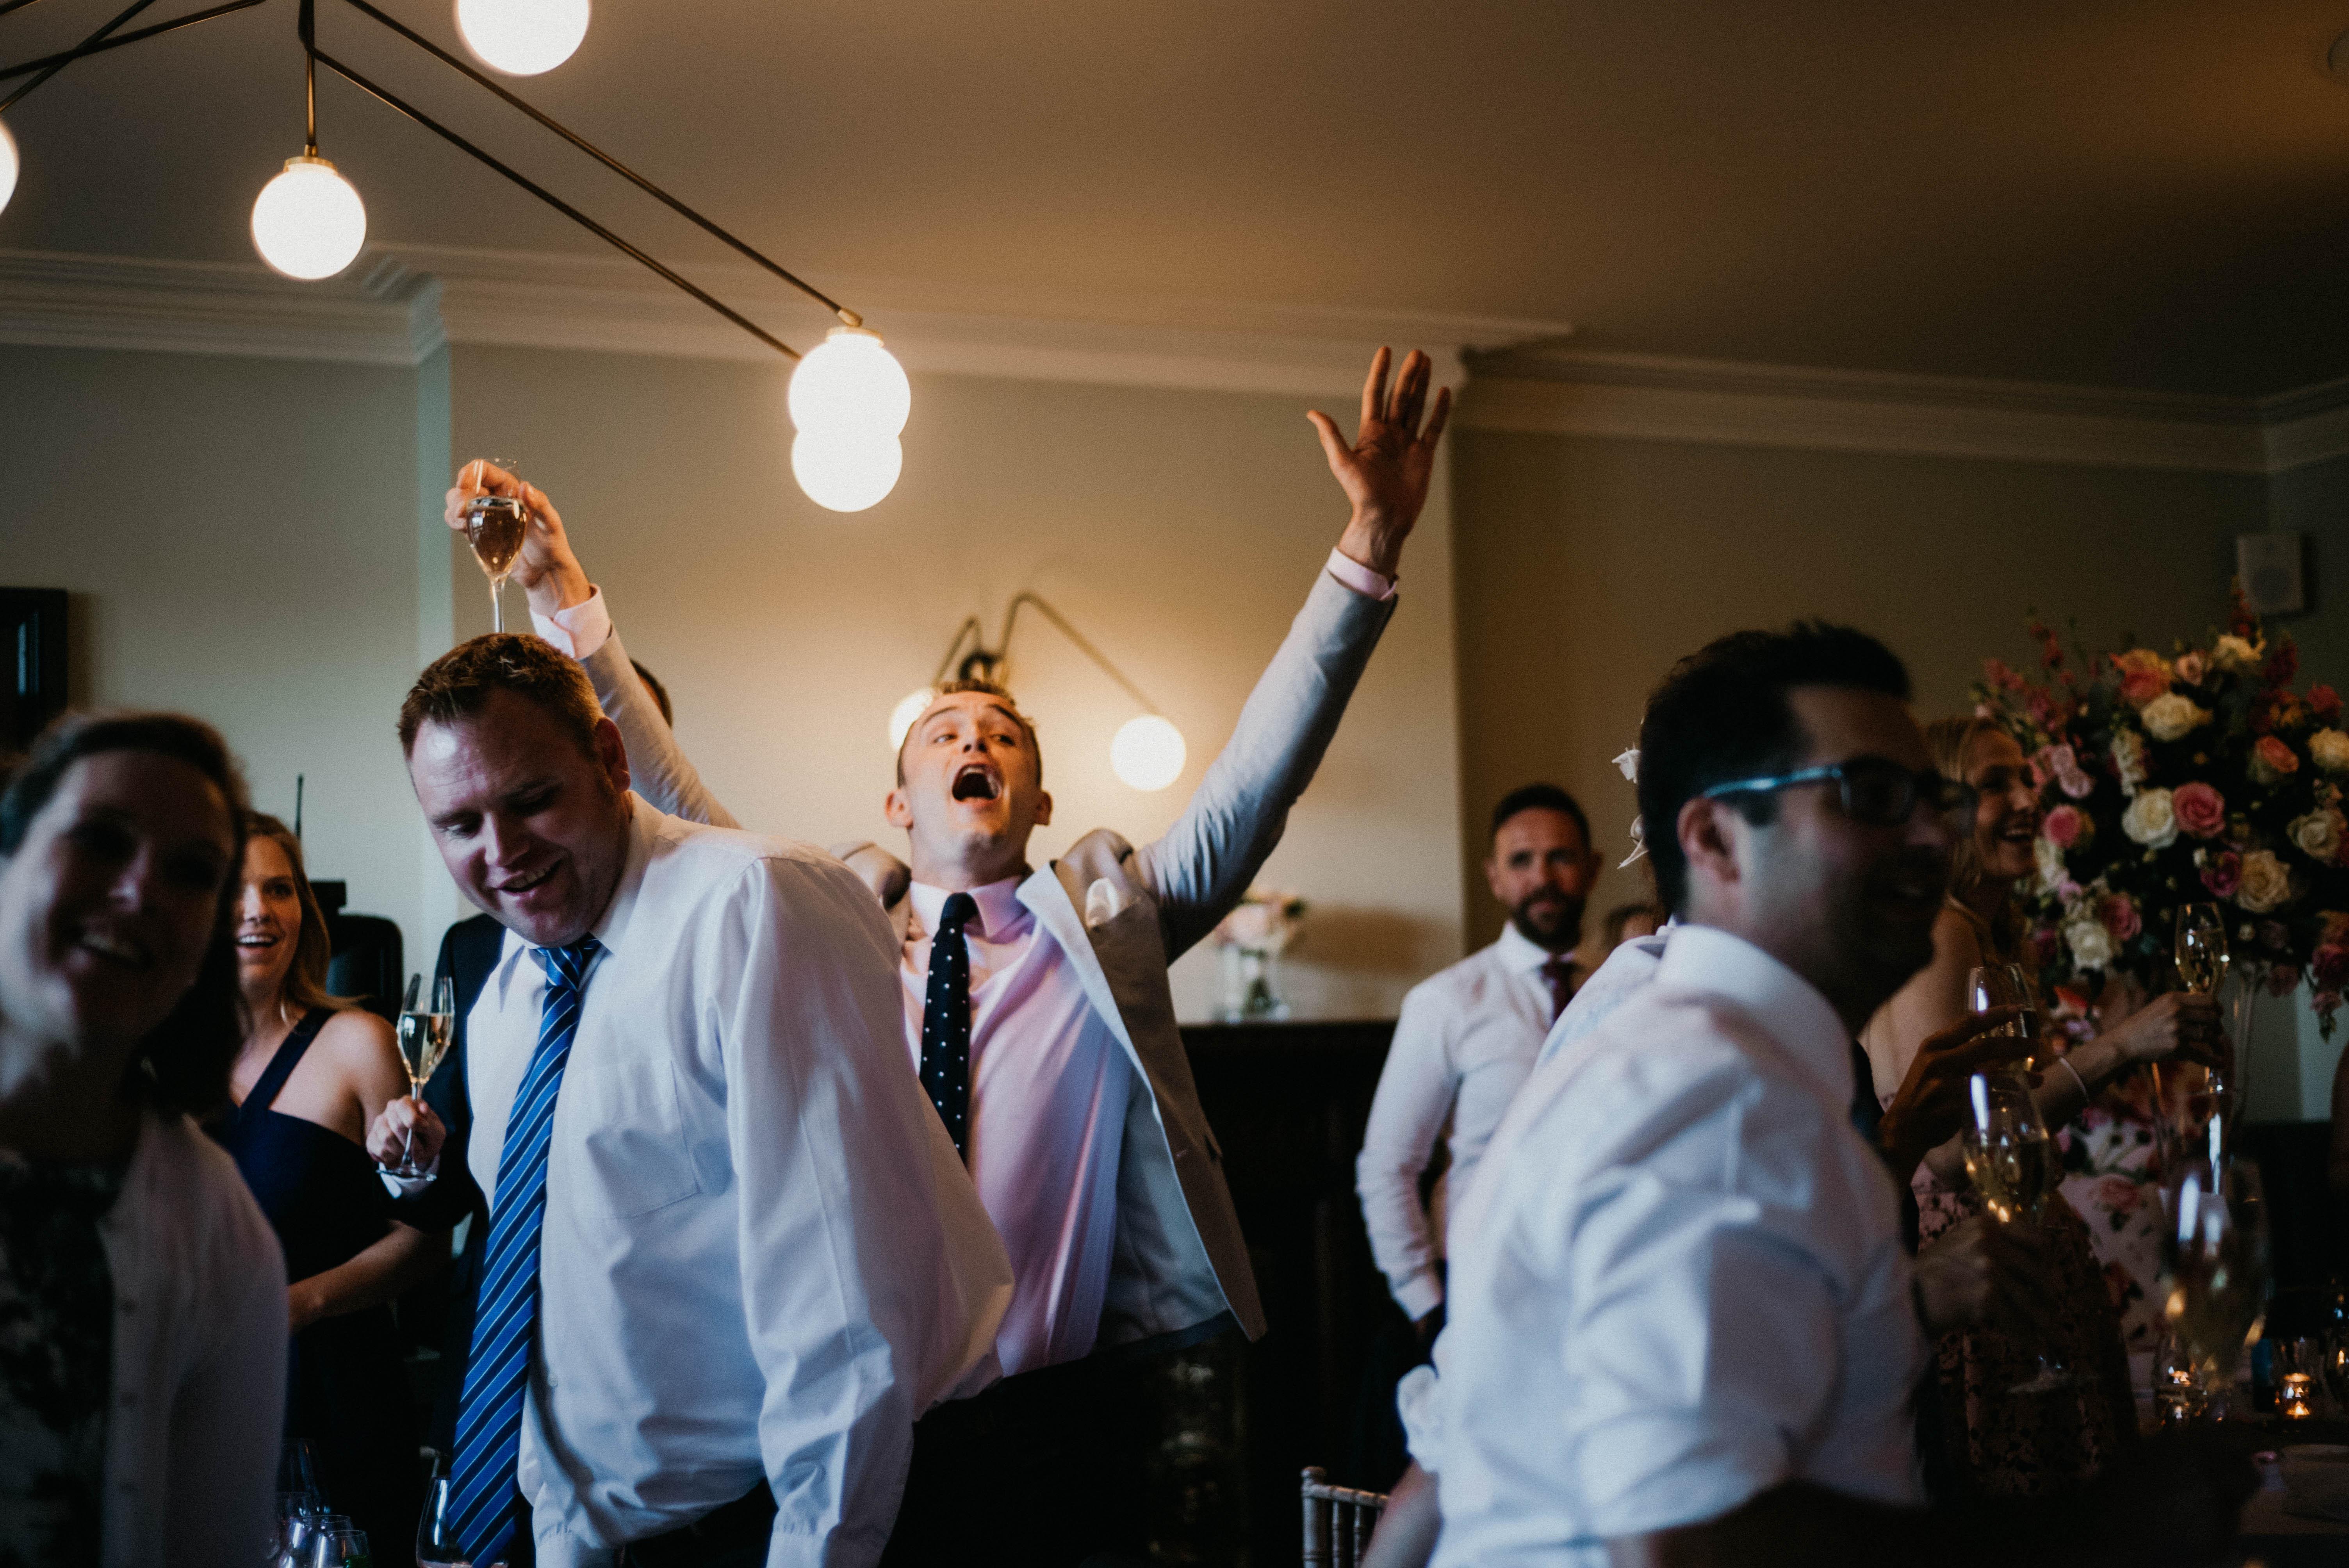 a wedding guests shouts